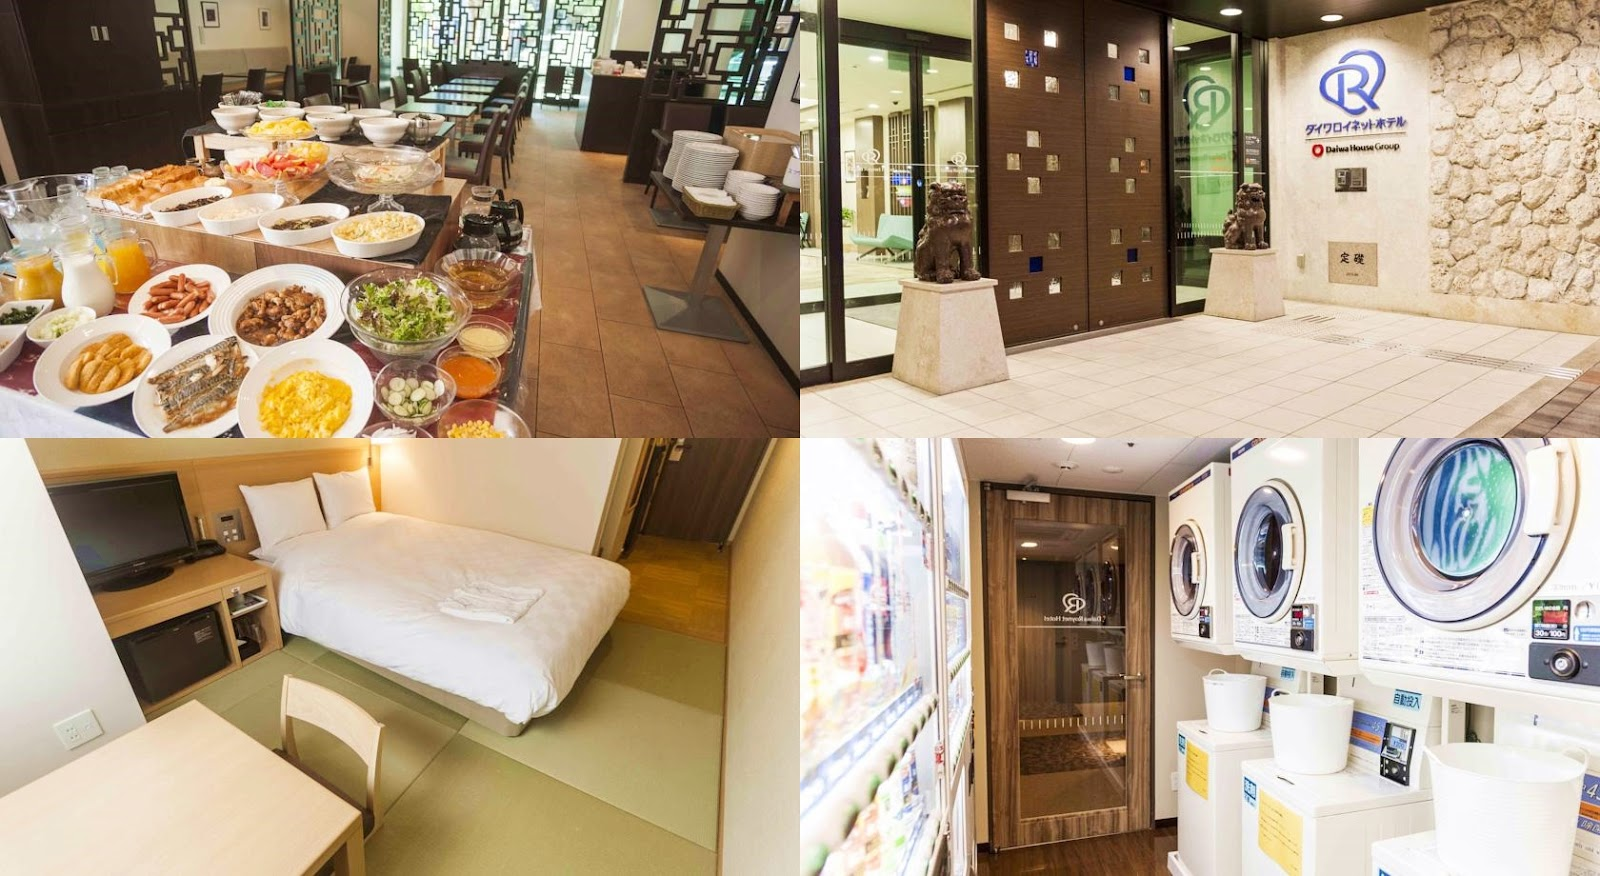 沖繩-住宿-推薦-那霸-縣廳前大和ROYNET酒店-Daiwa-Roynet-Hotel-Okinawa-Kenchomae-Okinawa-hotel-recommendation